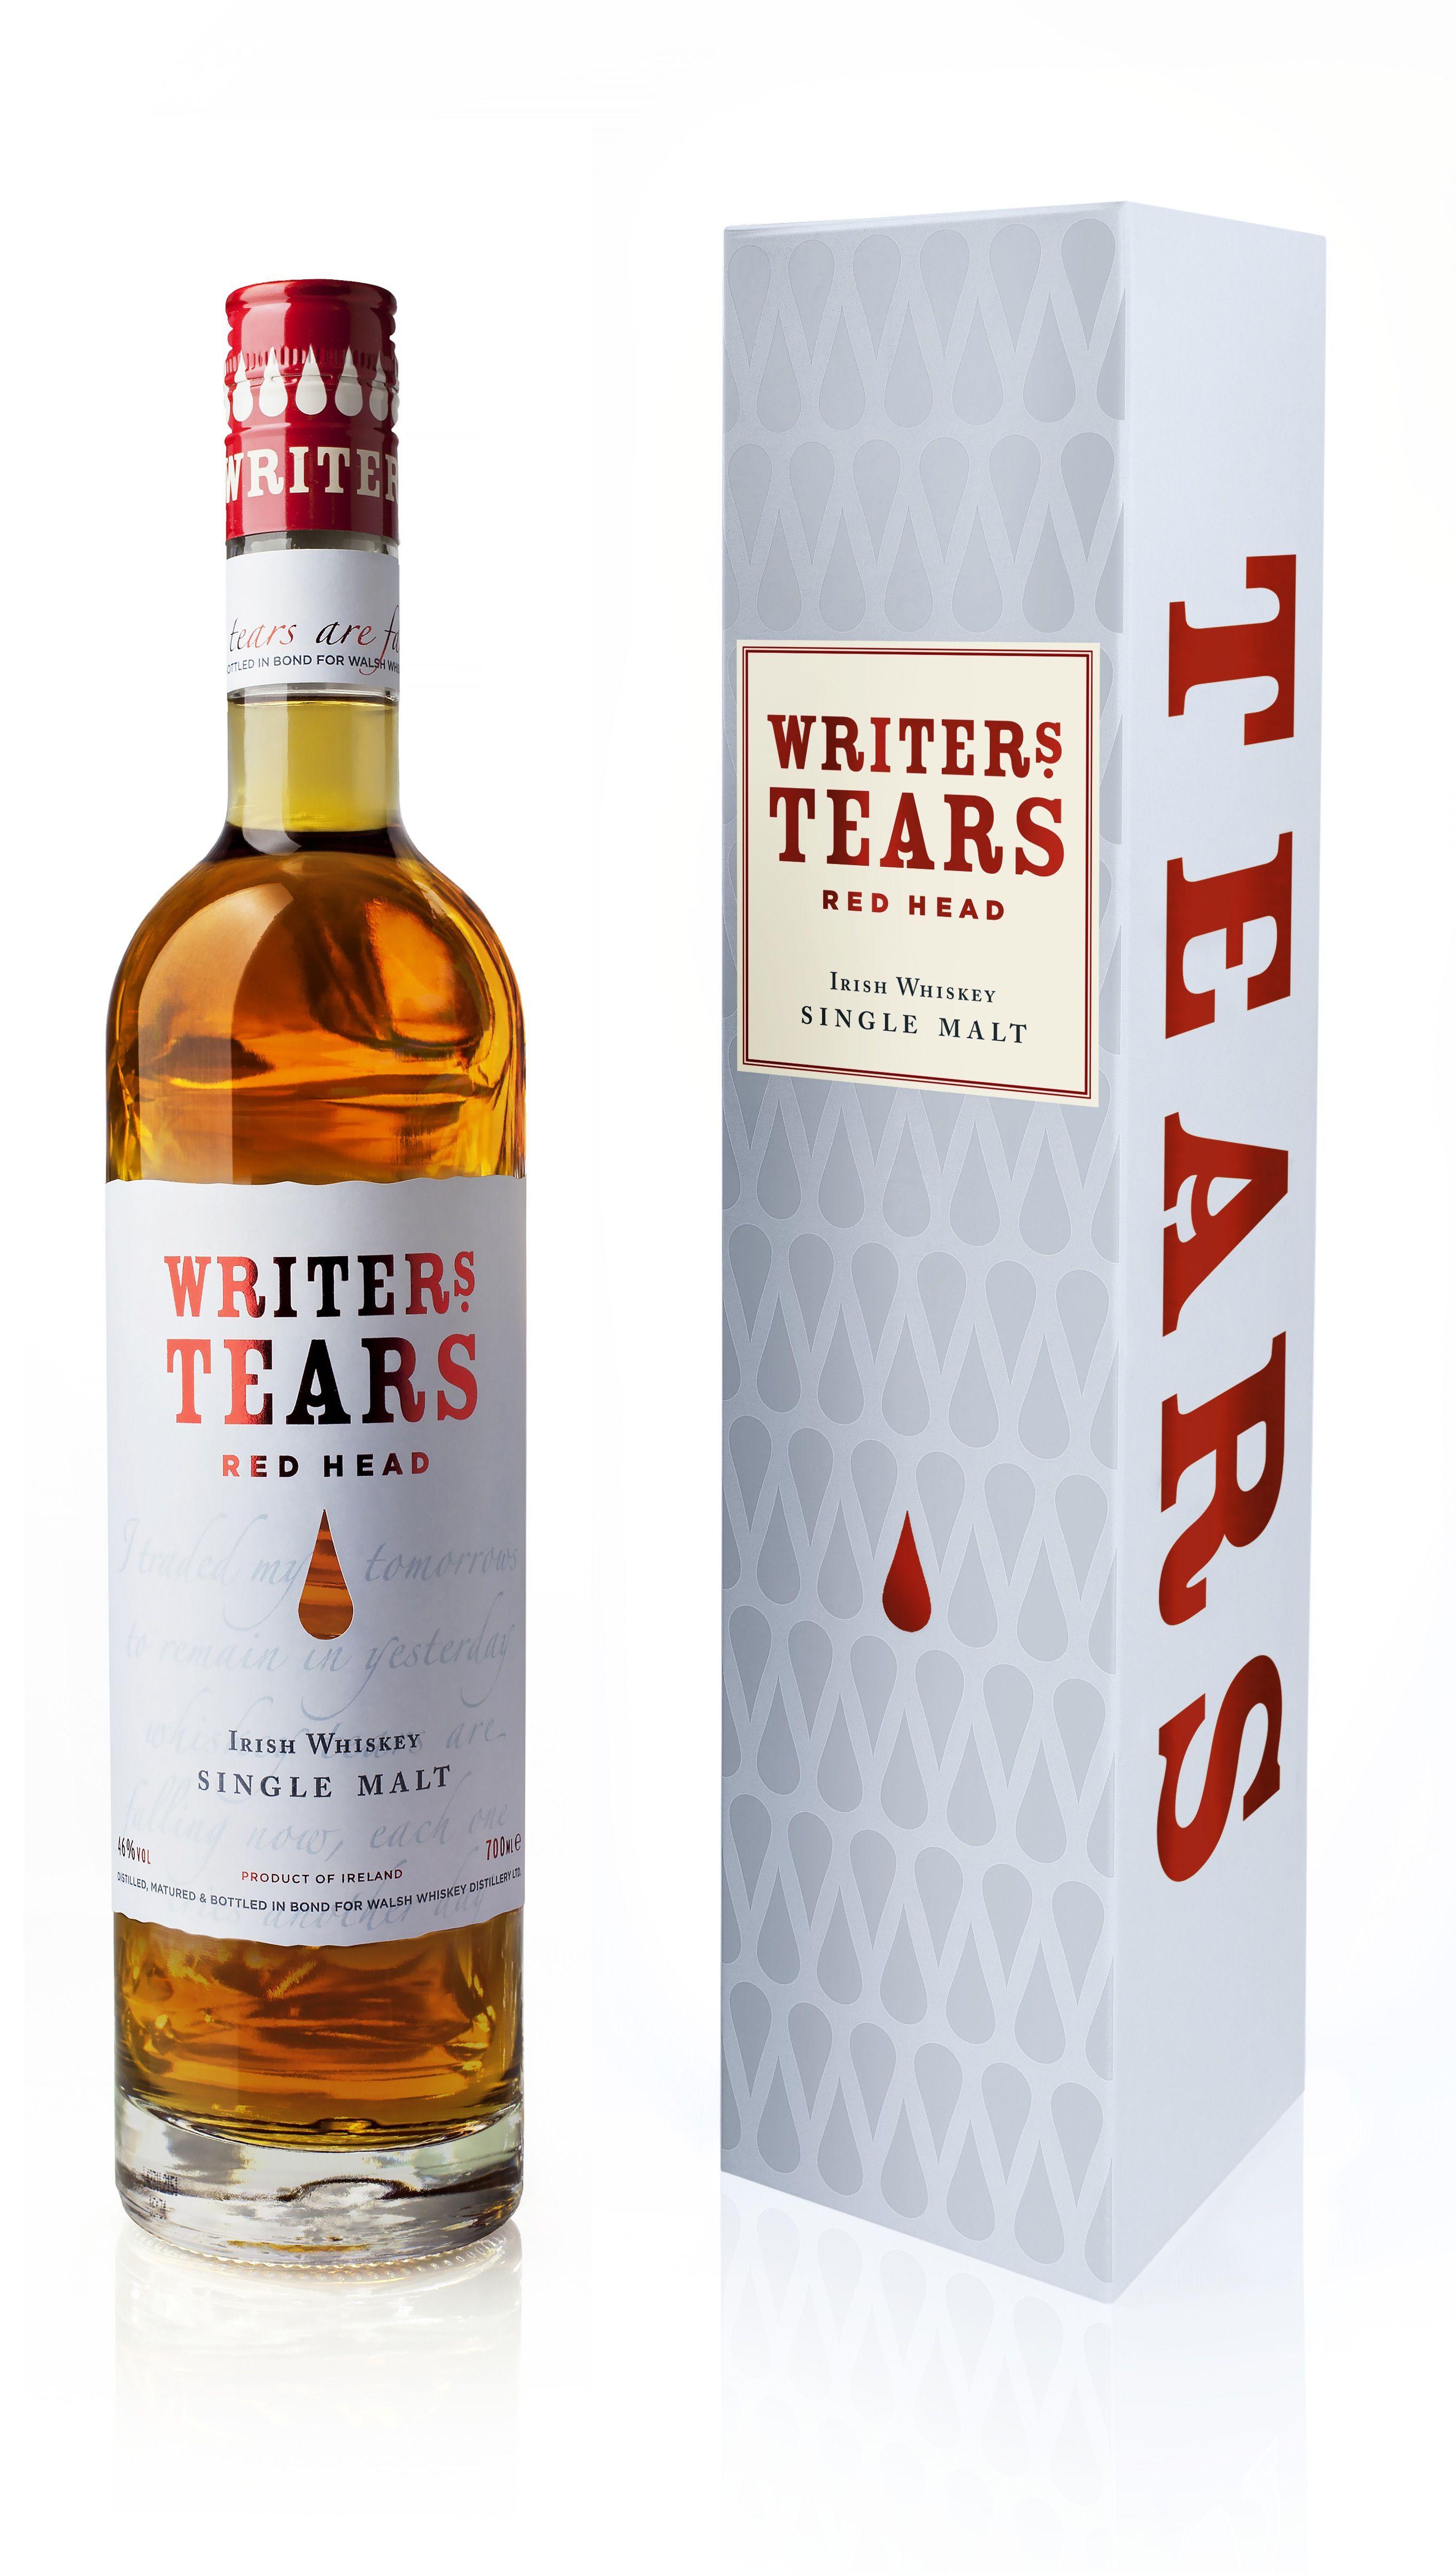 Whisky Weekend Update New Releases Irish Whiskey Single Malt